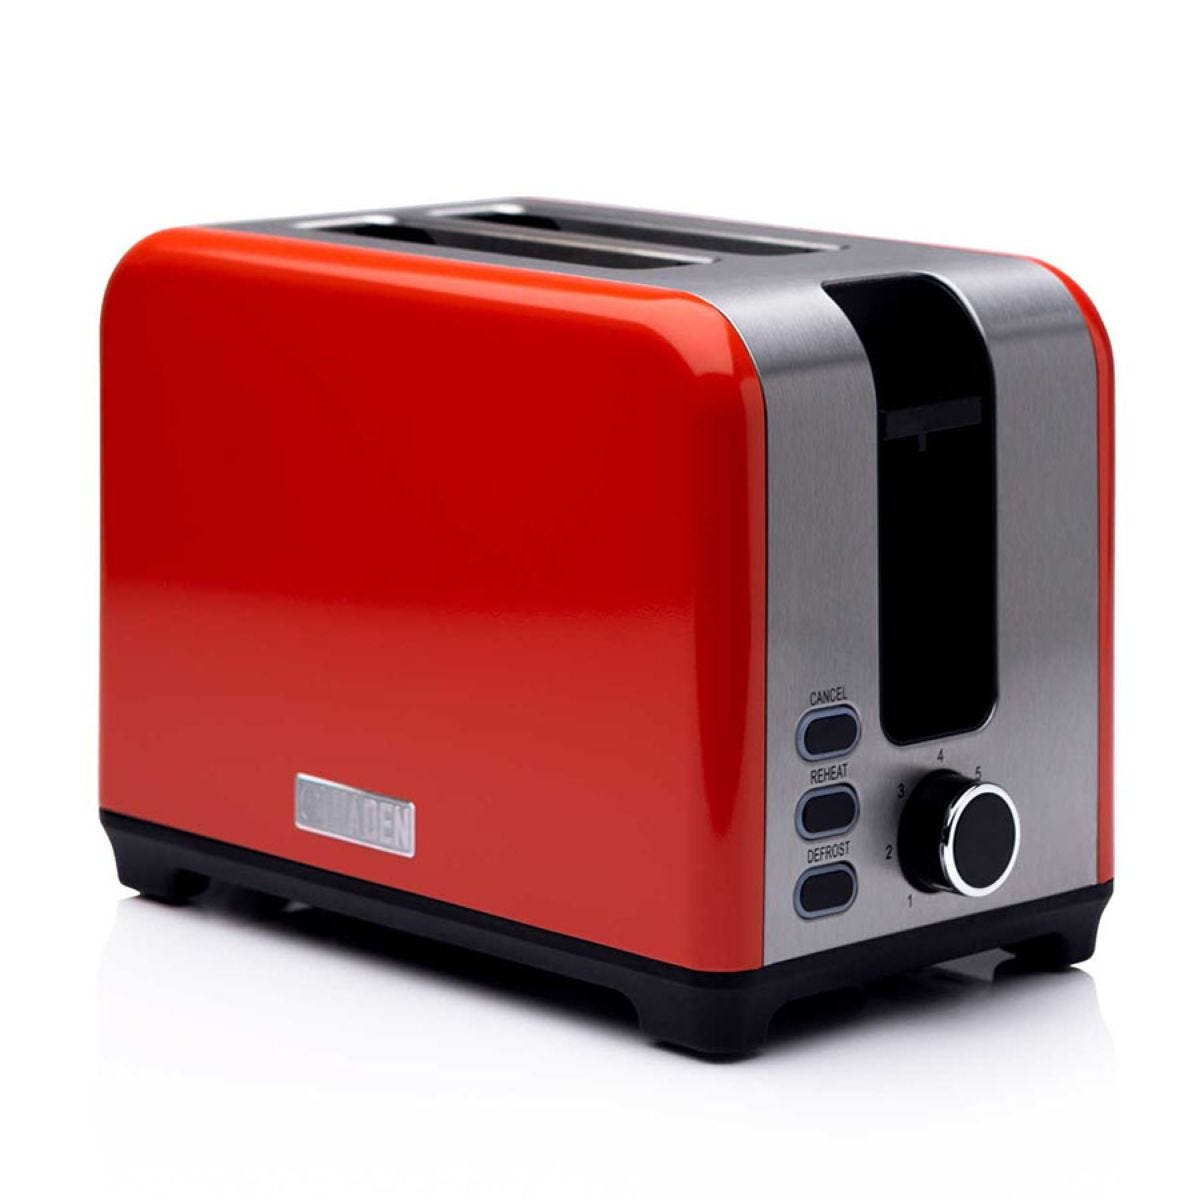 Haden Jersey 2-Slice Toaster - Marmalade